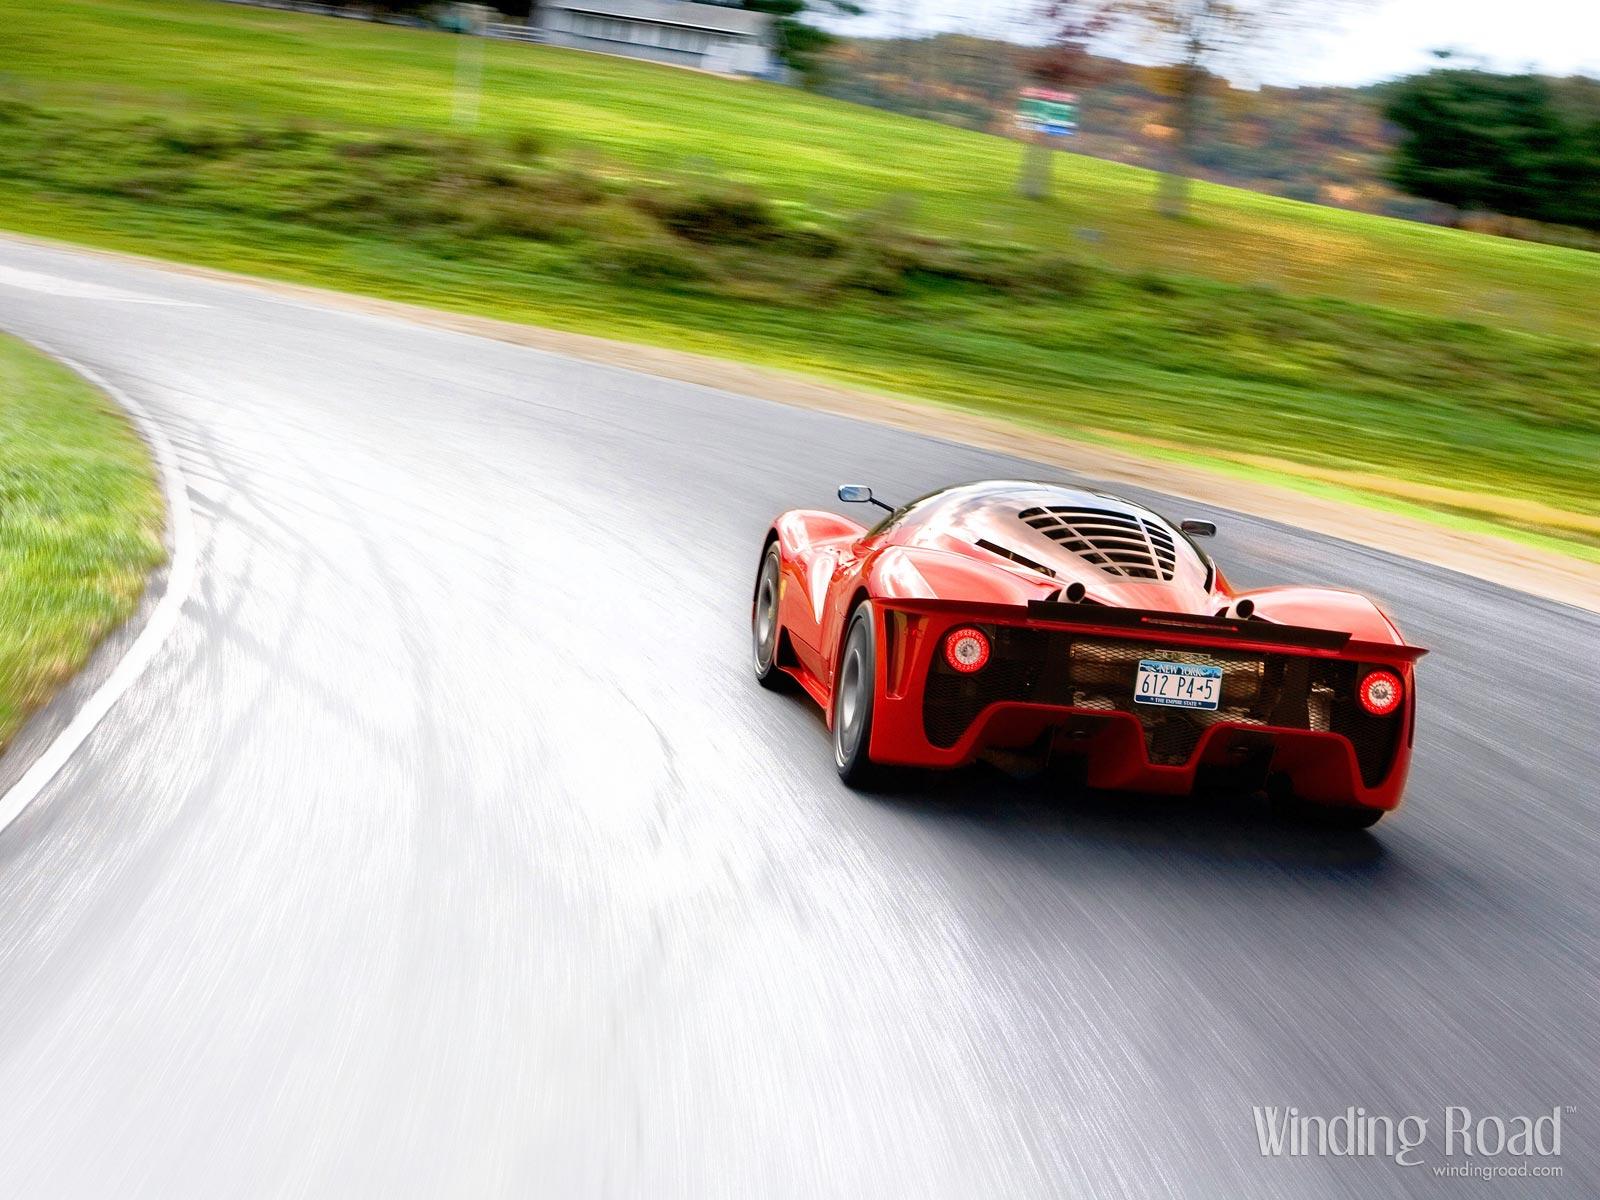 Most Viewed Ferrari Pininfarina P4 5 Concept Wallpapers 4k